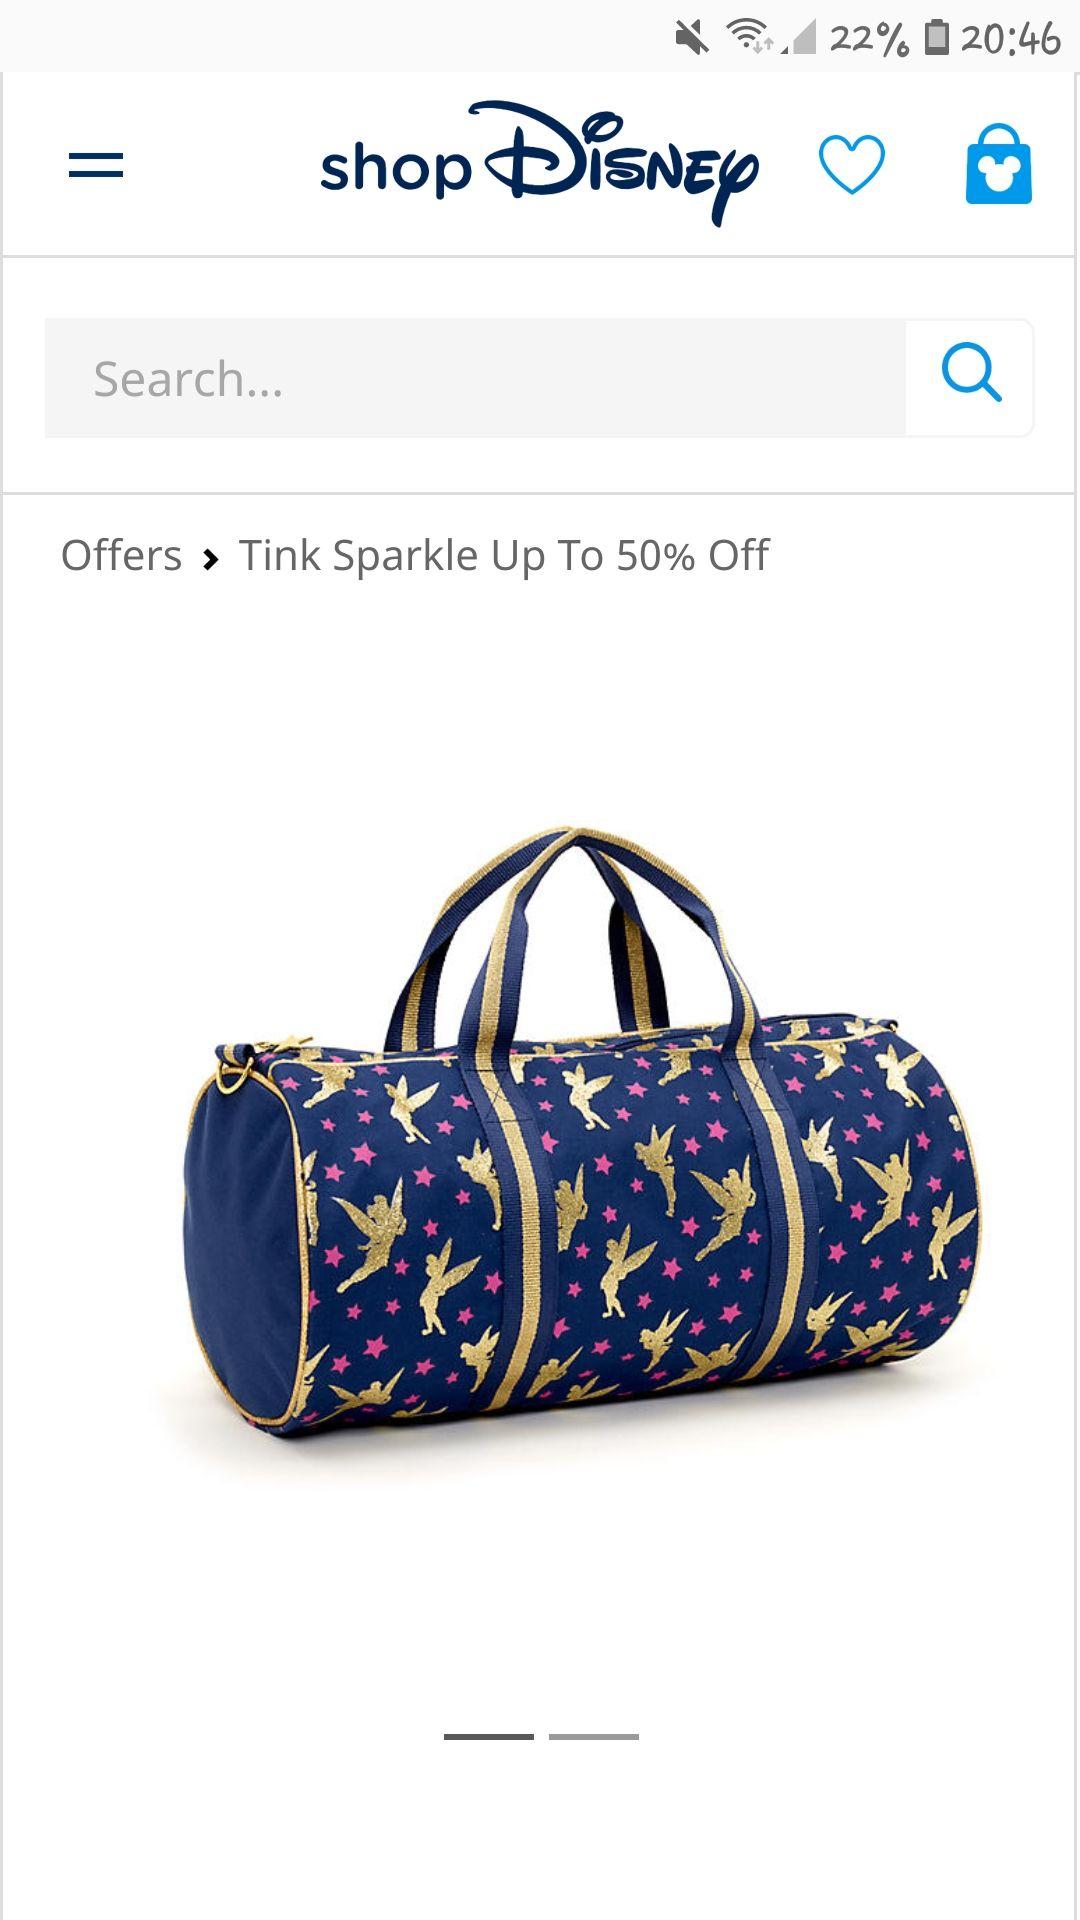 Tinkerbell duffle bag at the disney store £11 (+£3.95 P&P)